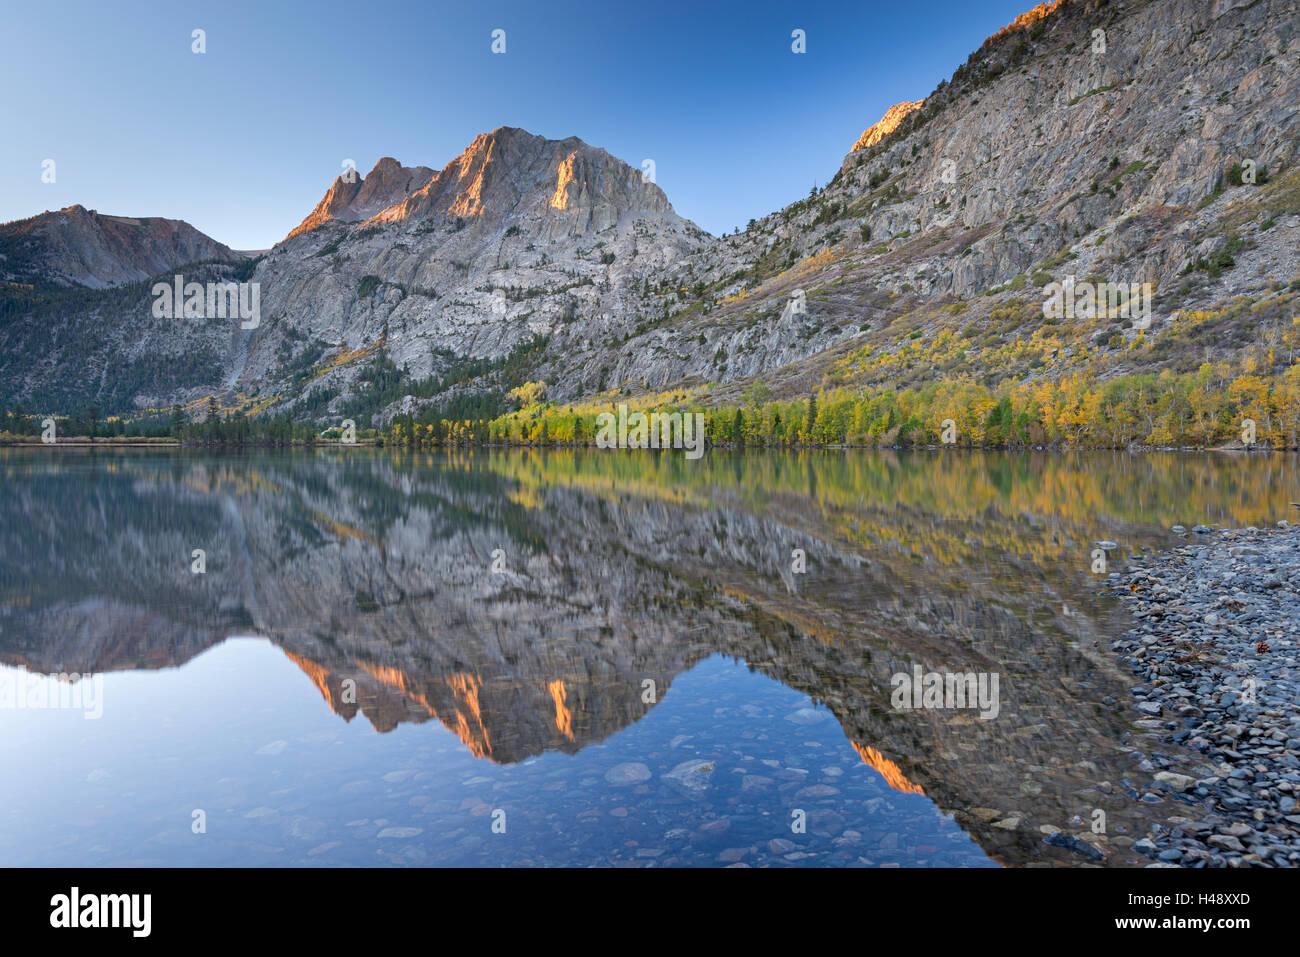 Carson Peak reflected in Silver Lake at dawn, June Lake Loop, California, USA. Autumn (October) 2014. - Stock Image